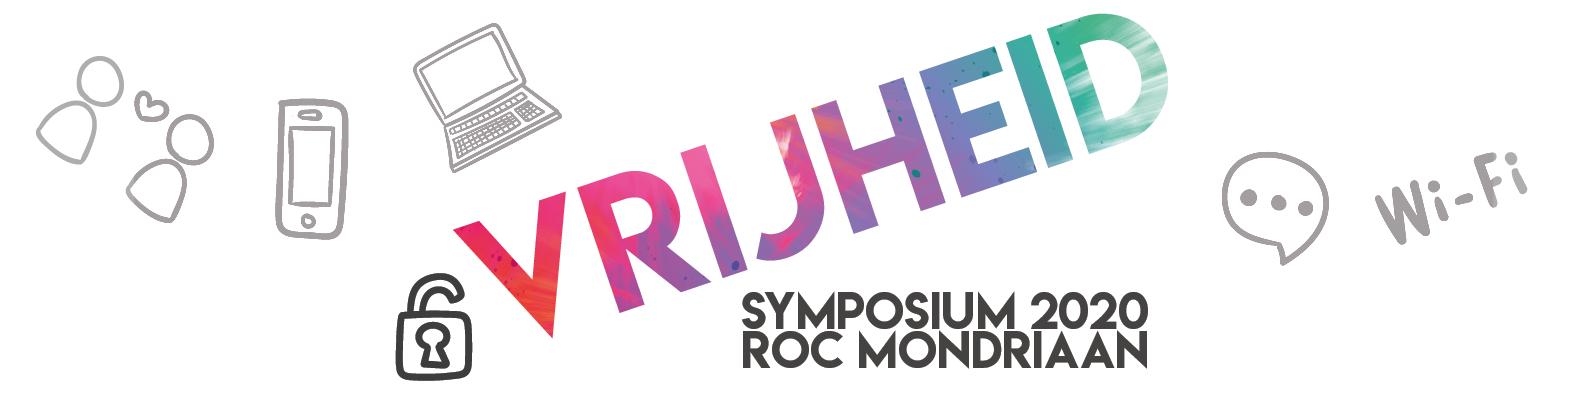 Symposium maart 2020